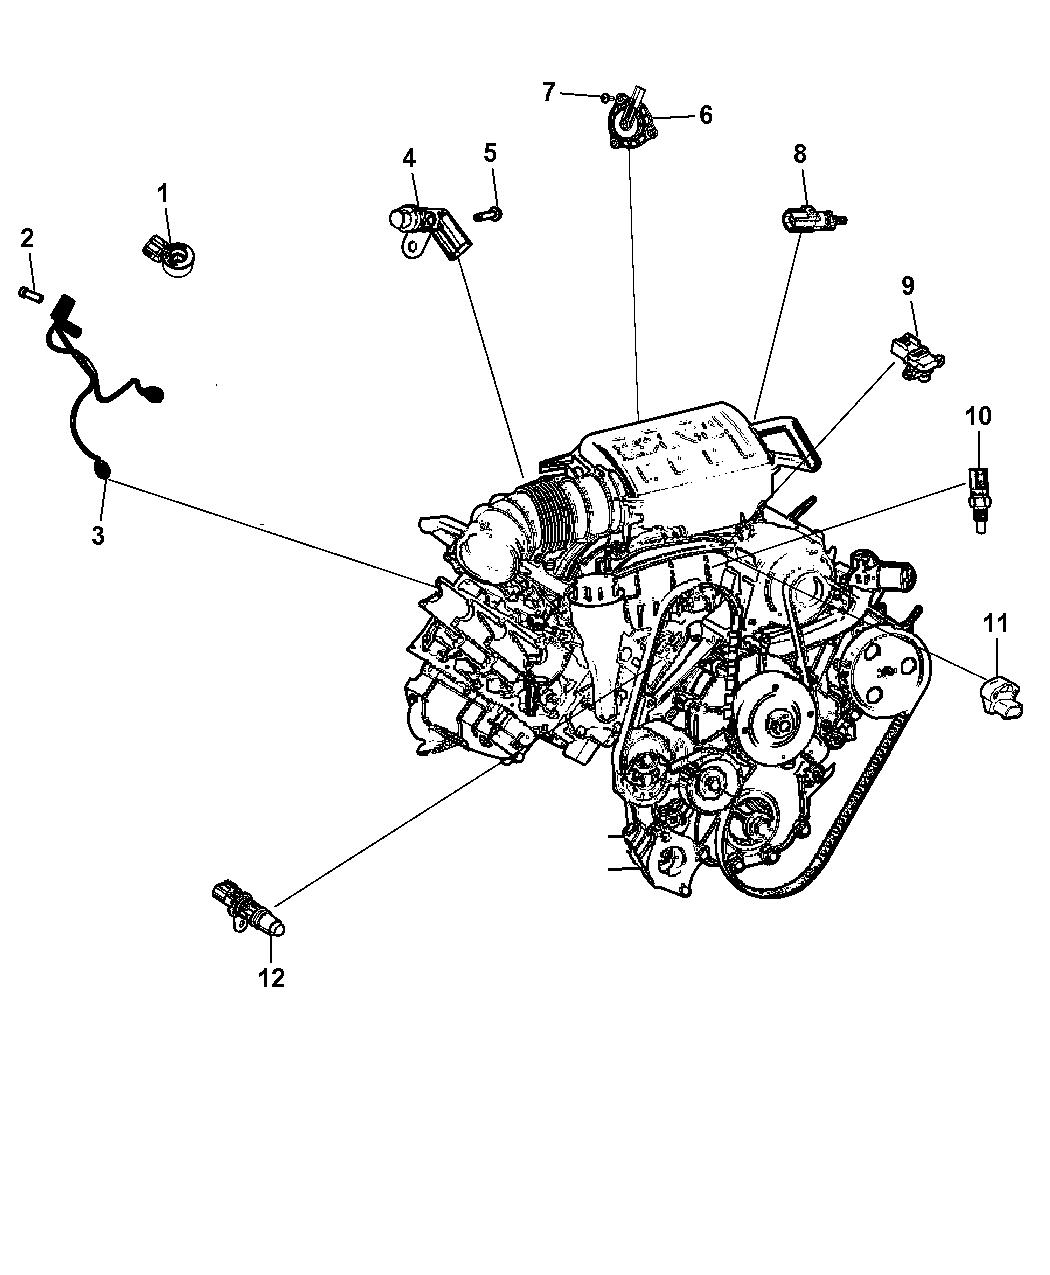 2013 Dodge Challenger Sensors - Engine - Thumbnail 1